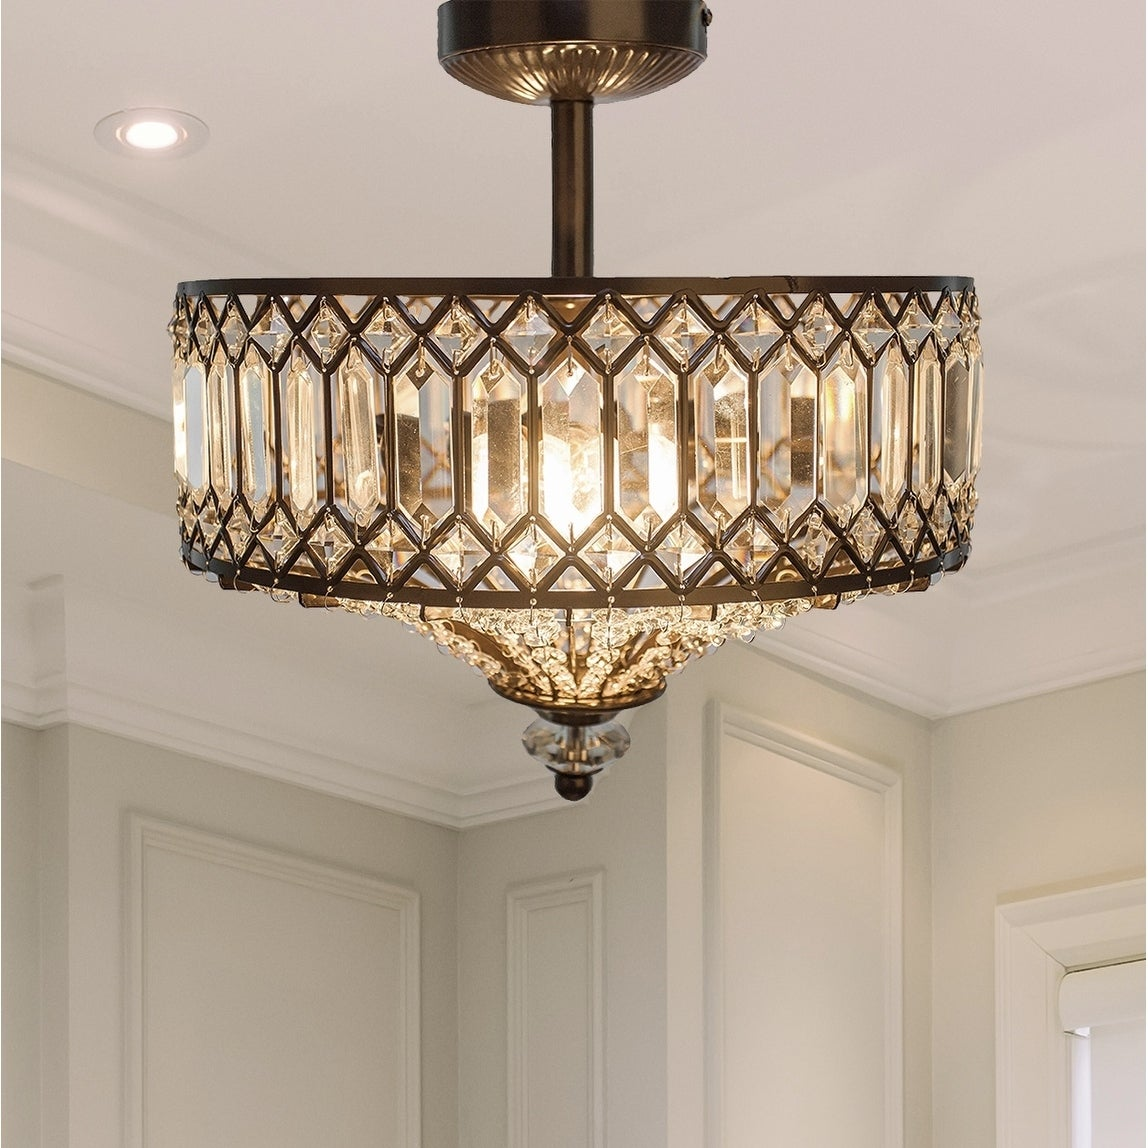 Silver Orchid Furey Tiered Jeweled Glass + Bronzed Metal Semi-Flush Mount Lighting Fixture